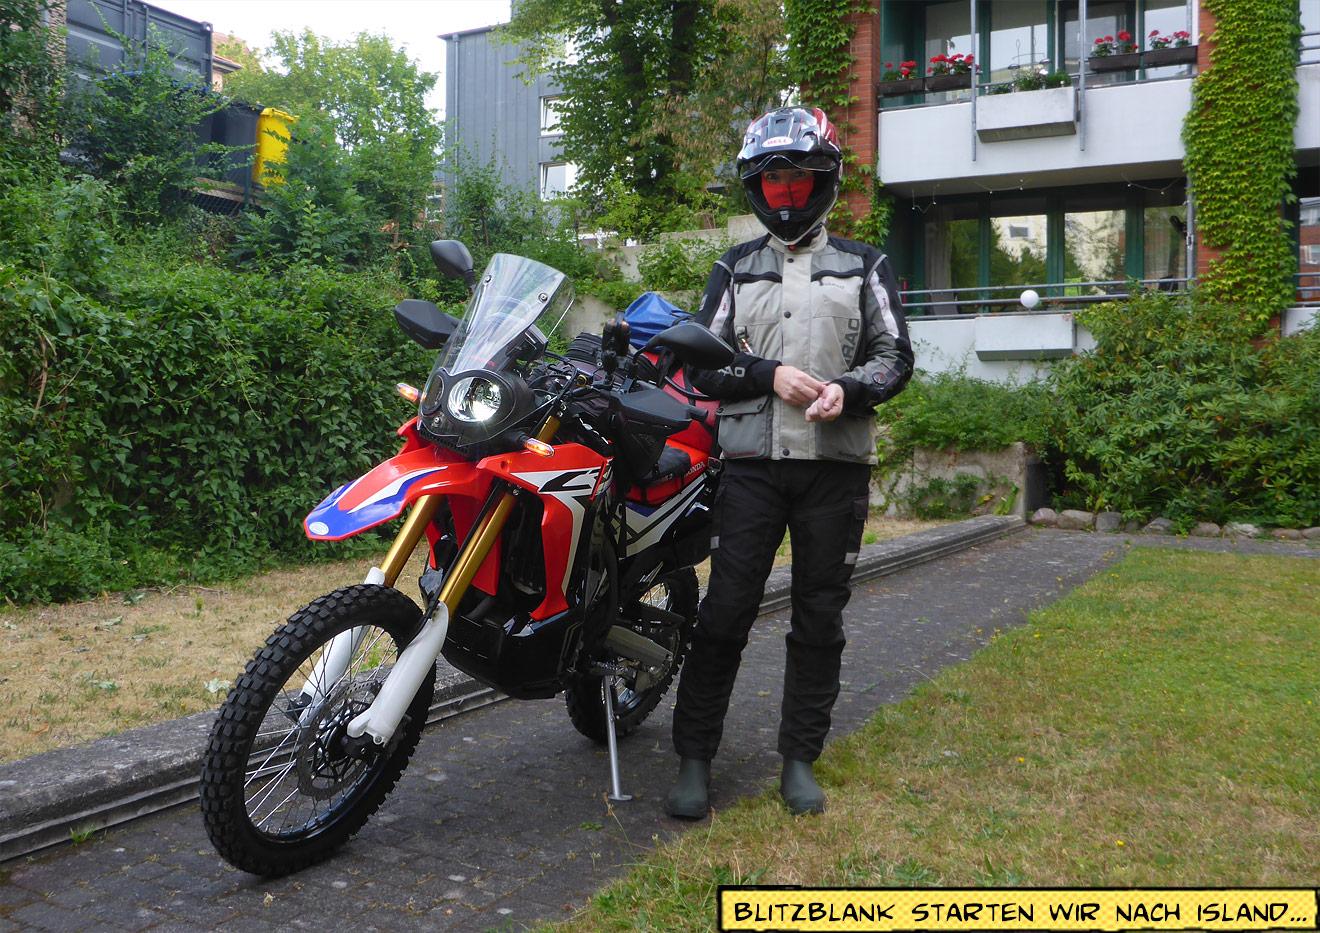 Motorrad in der Tiefgarage